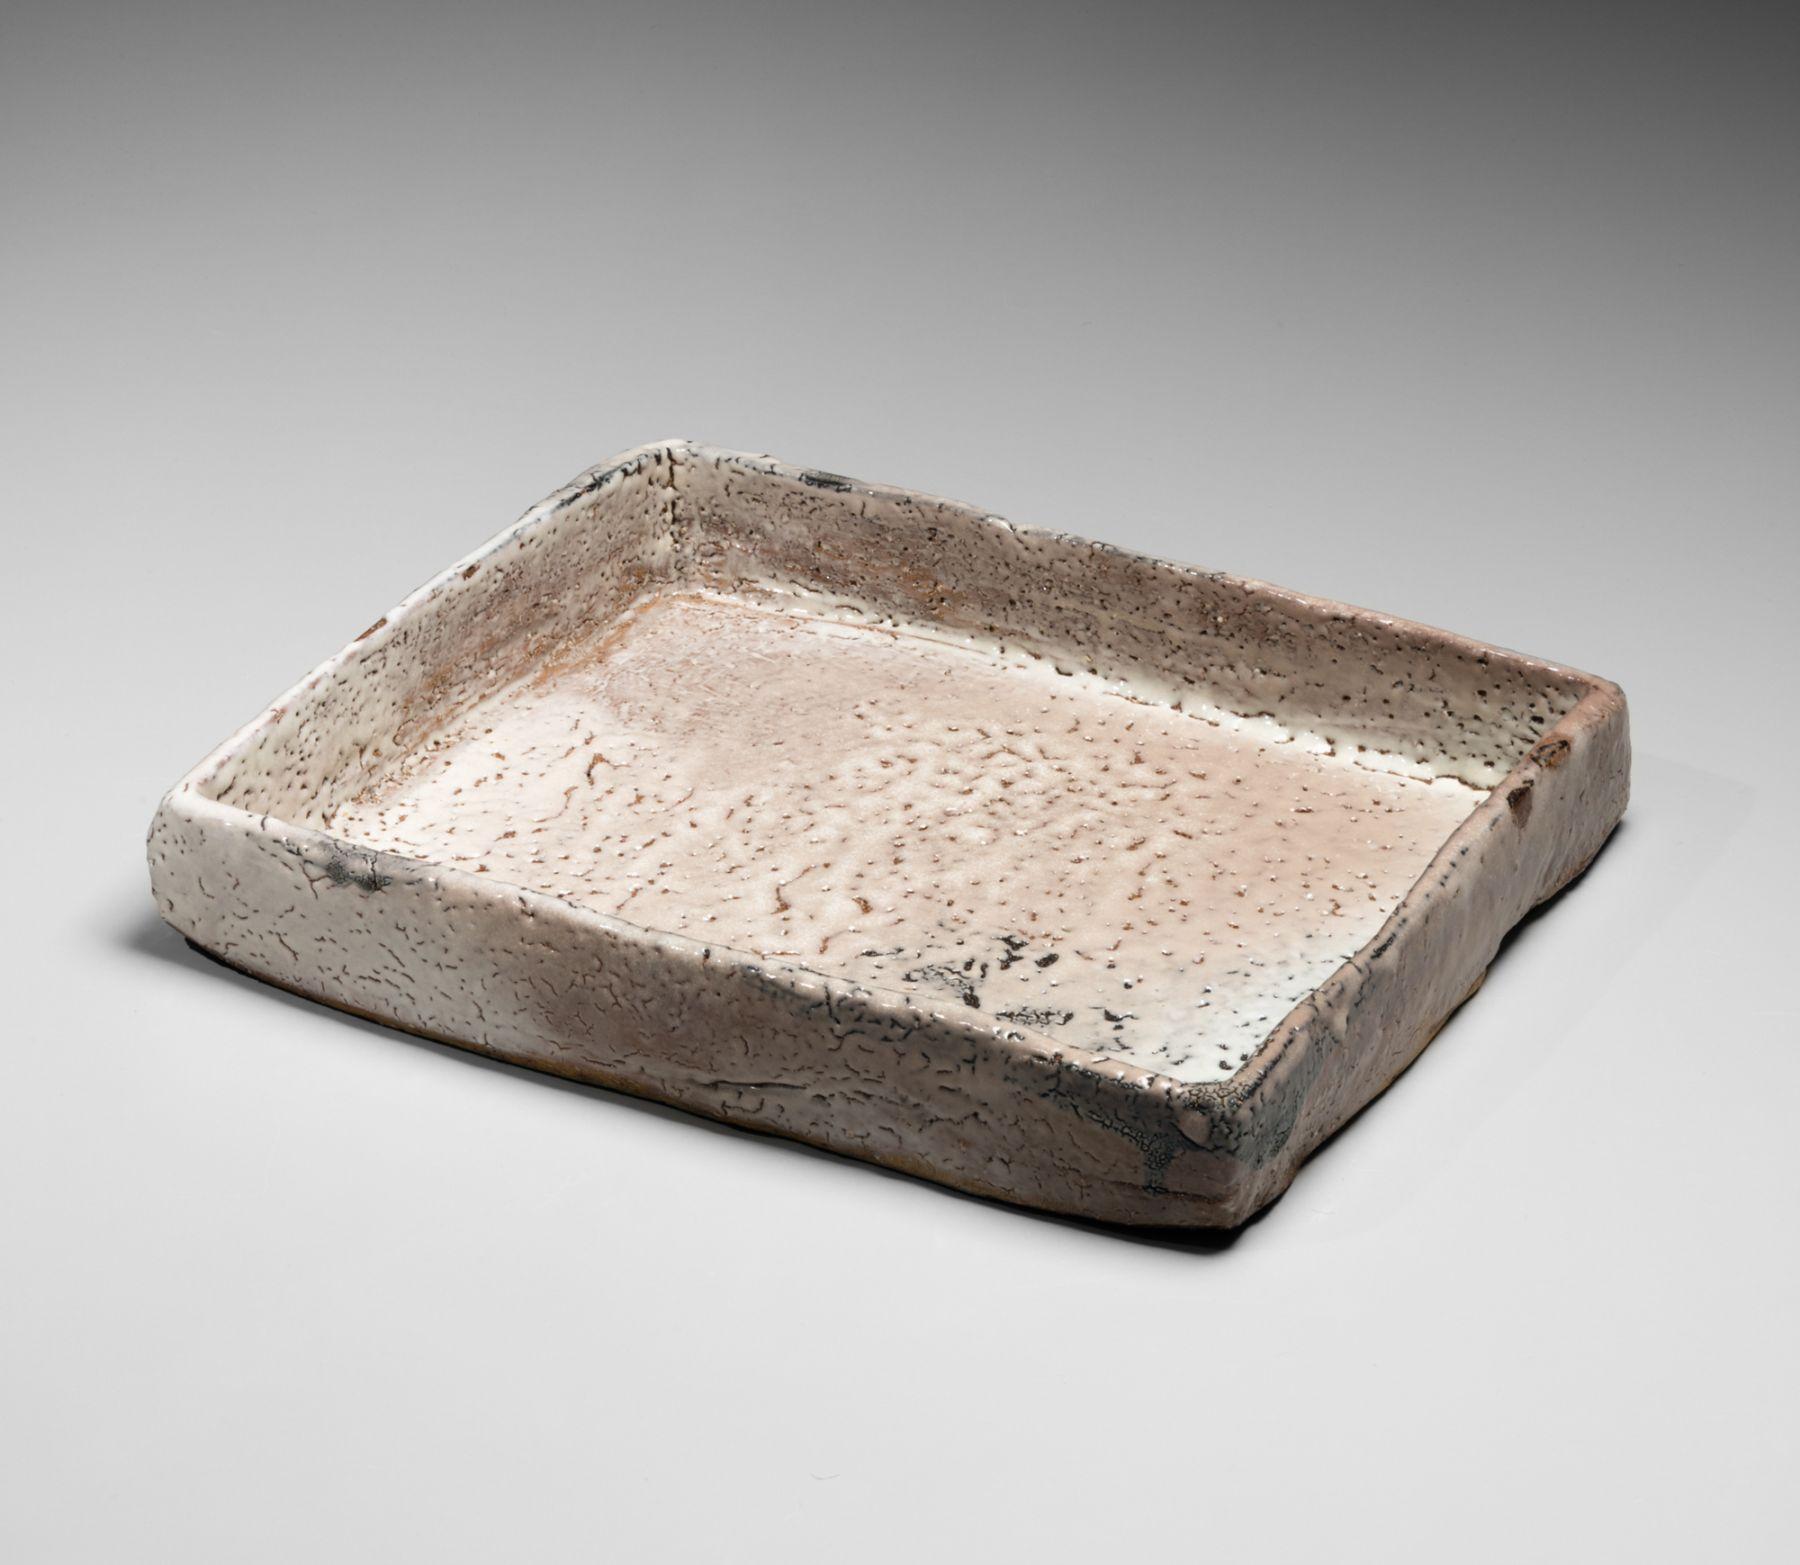 Miwa Kyūsetsu XI (Jusetsu) (1910-2012), Pinkish-white, crawling, Hagi-glazed plate